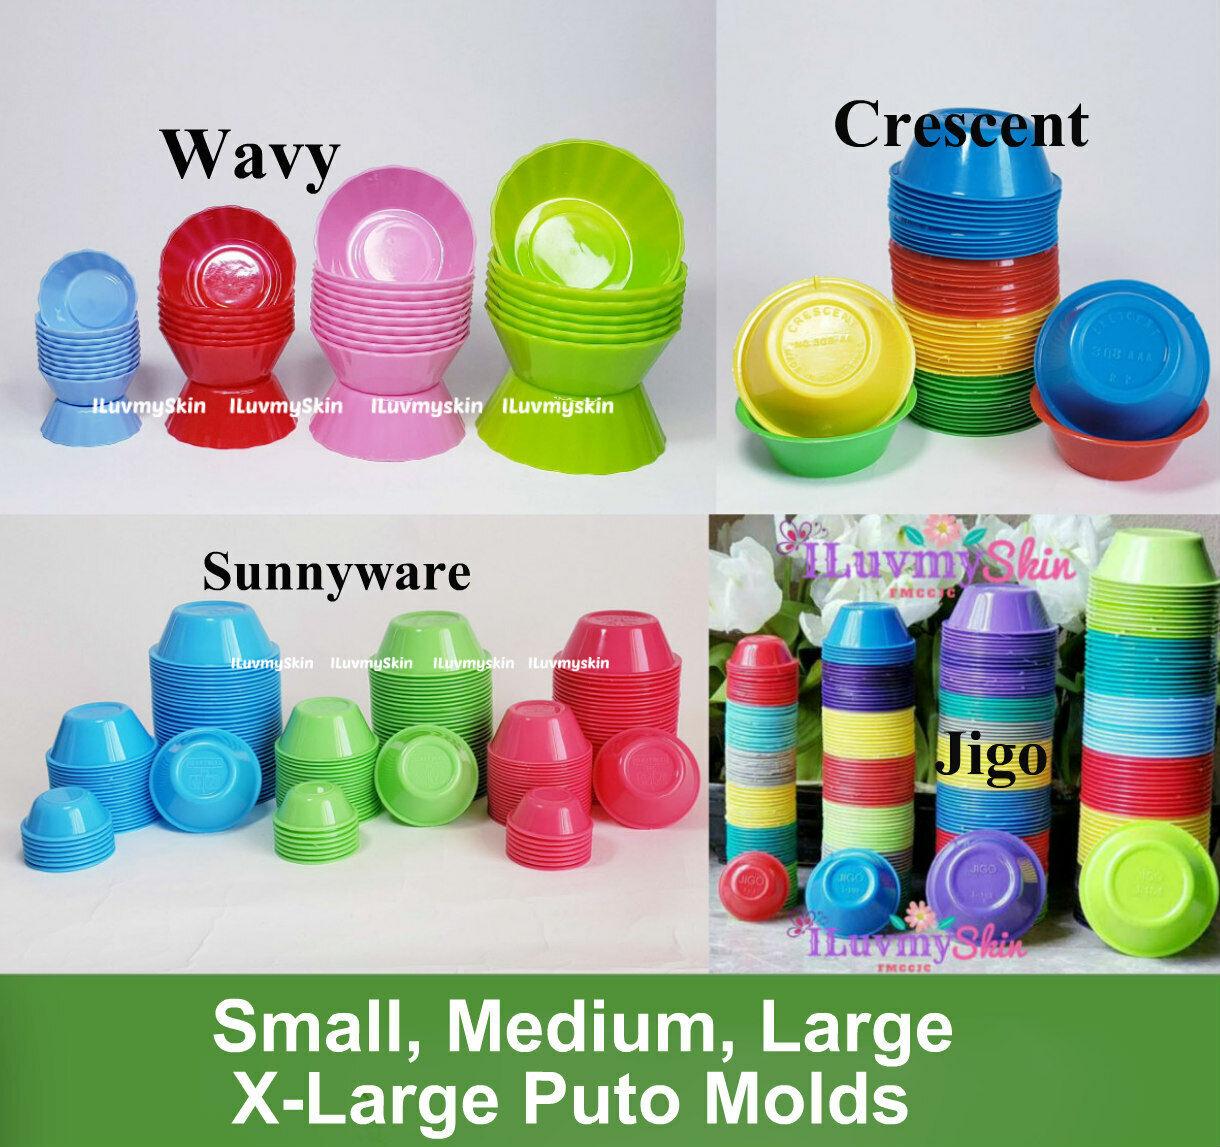 Puto, Kutsinta, Pichi Pichi Plastic Cup Molder...Different Brands and Style